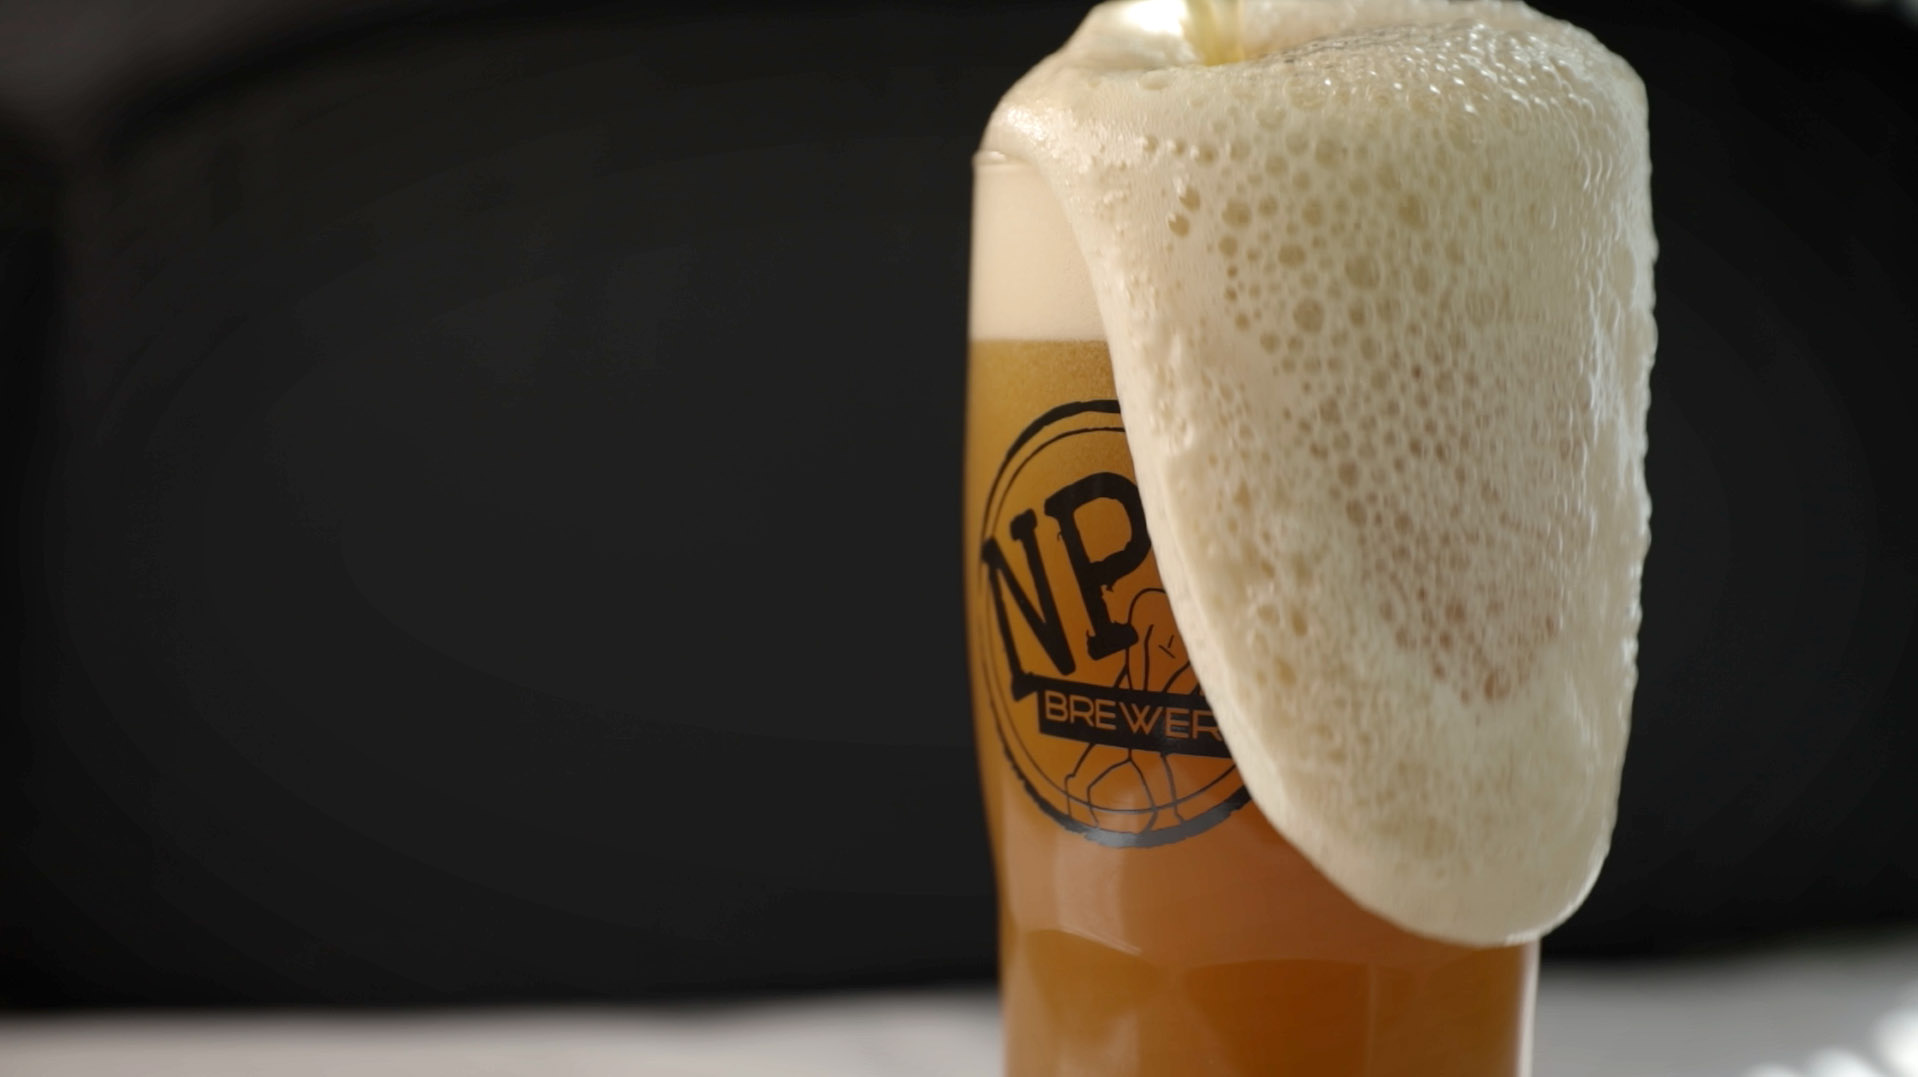 gw-np-brewers.jpg